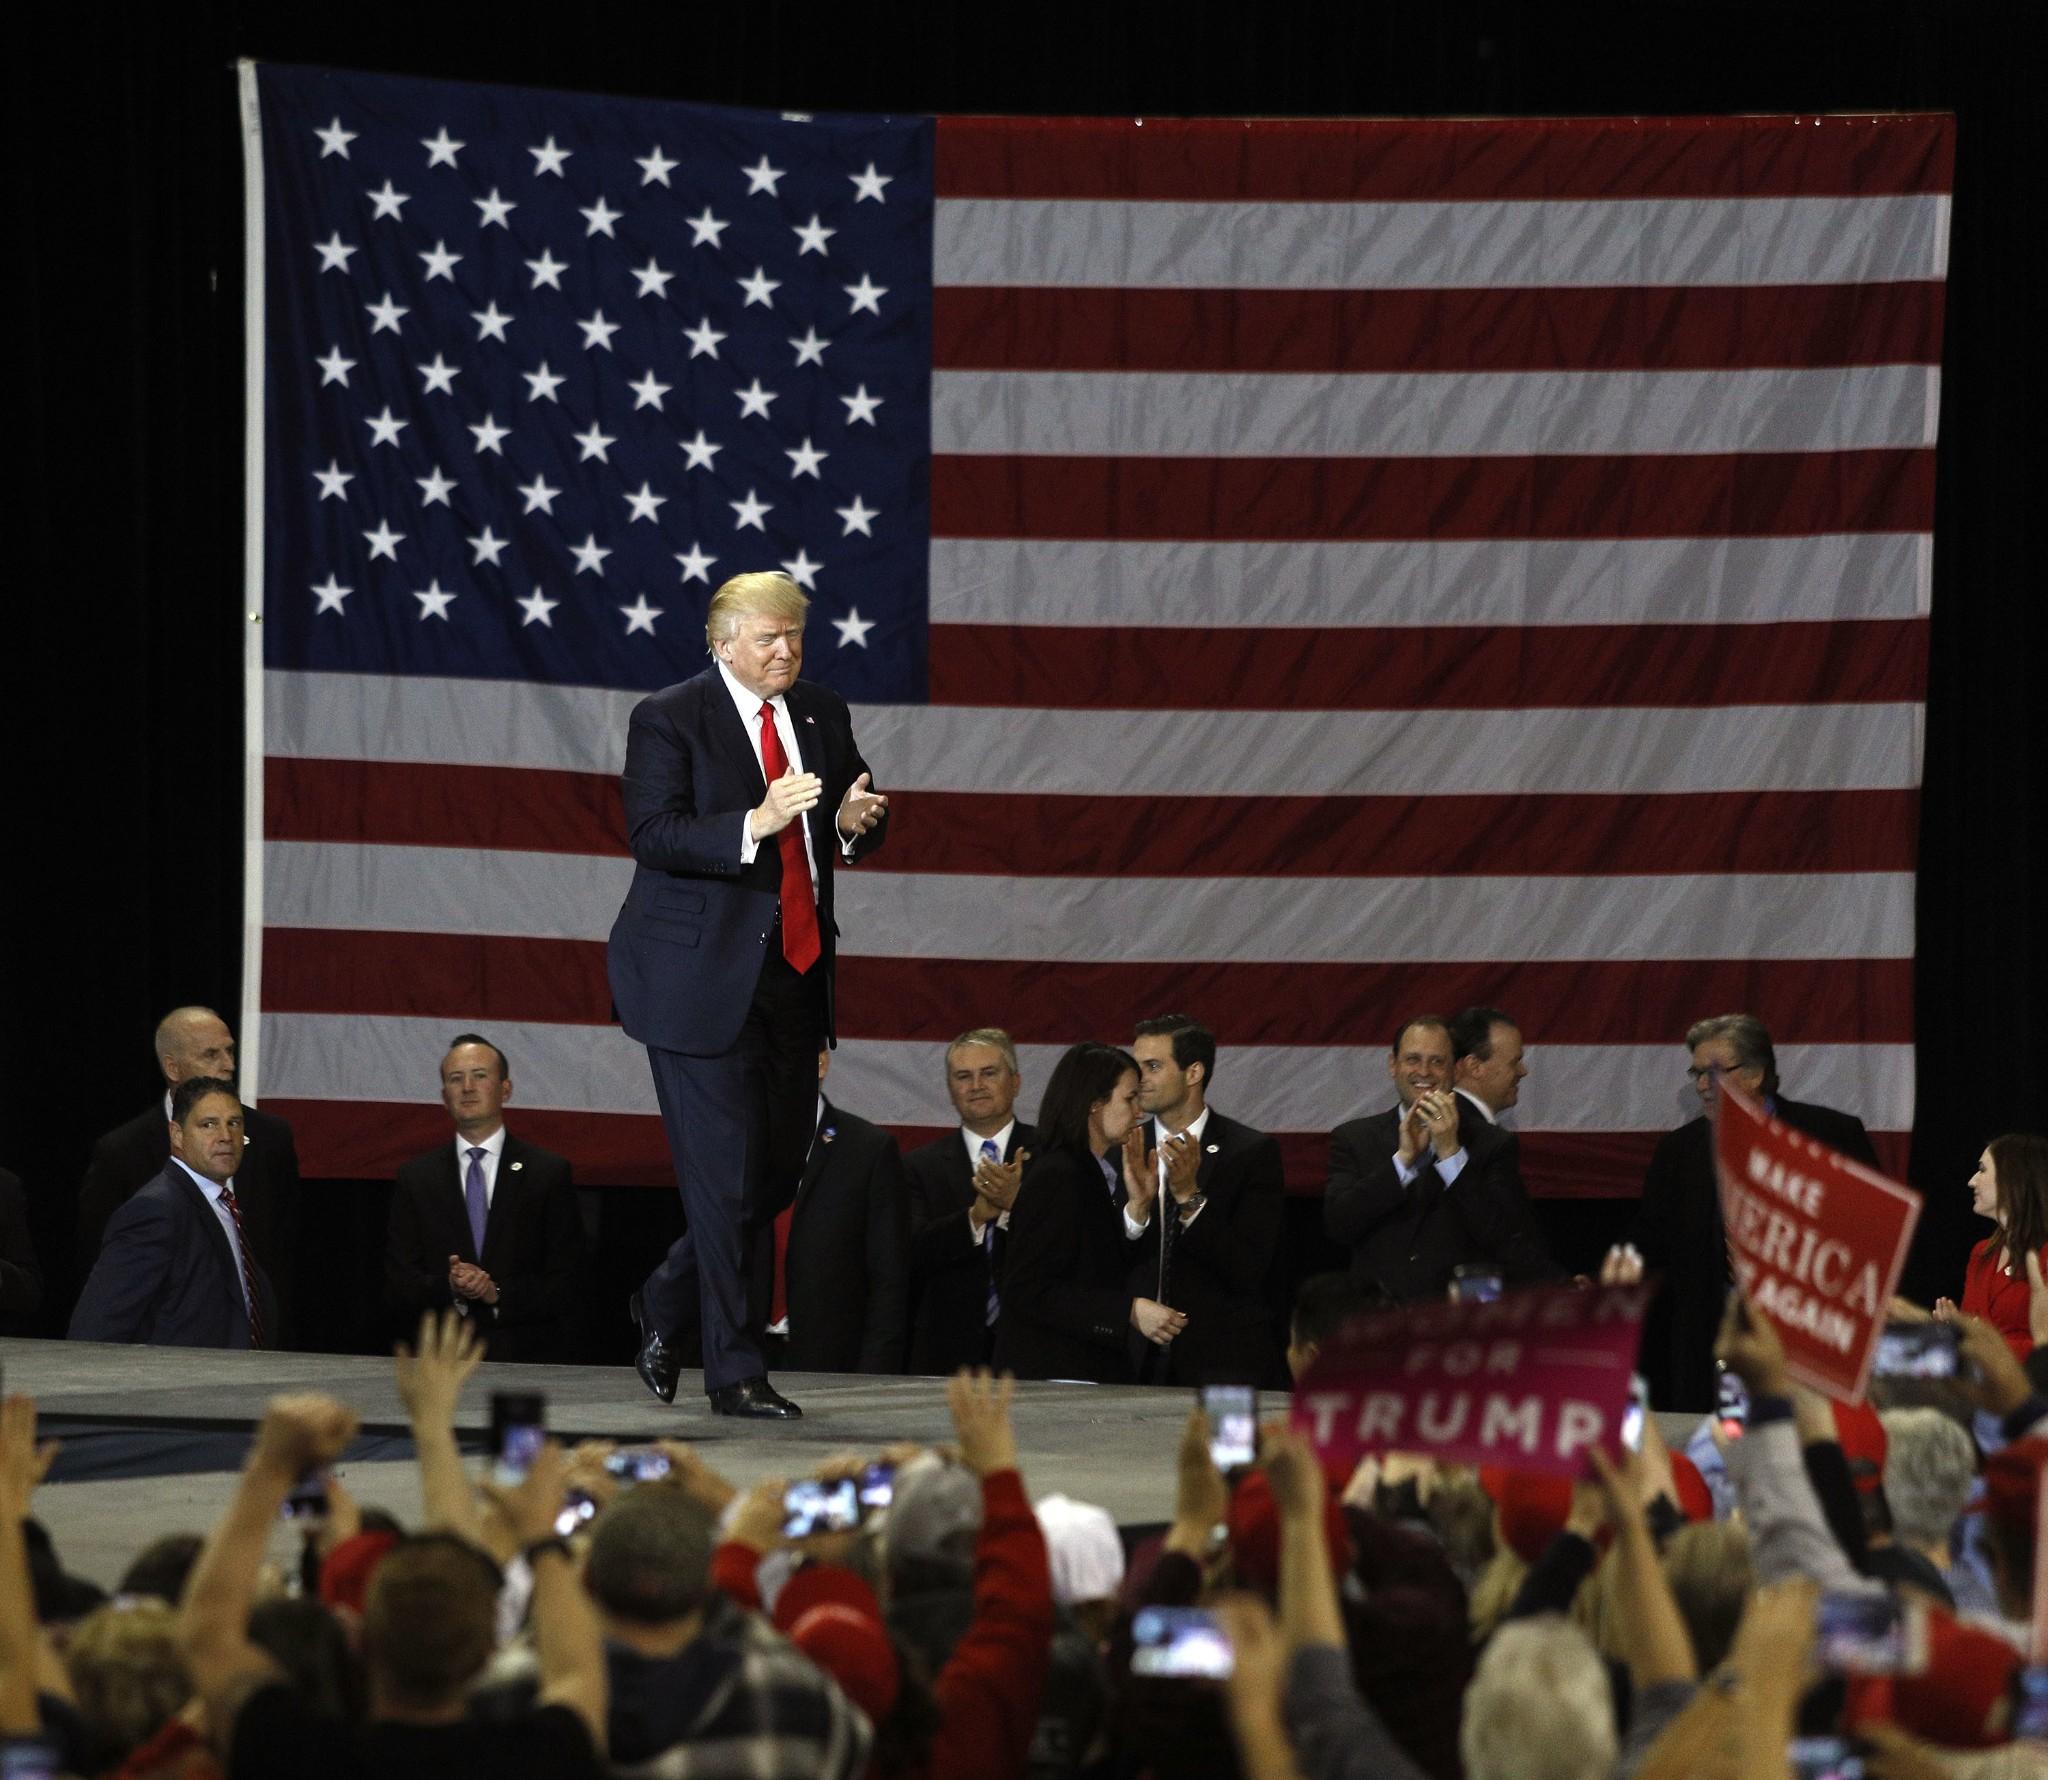 6 reasons the Trump presidency is in shambles